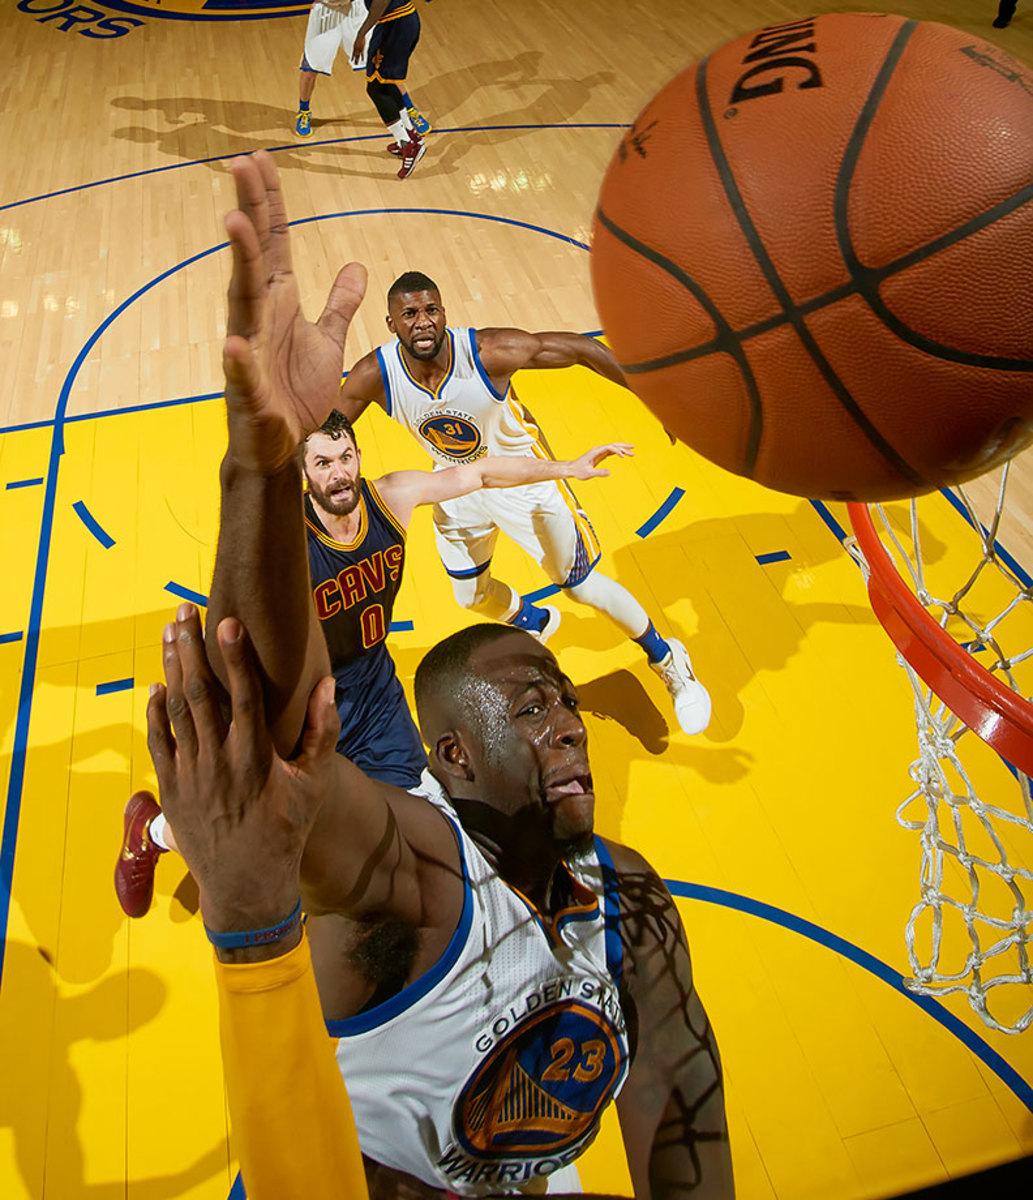 18-NBA-Finals-Game-1-Draymond-Green-SI133_TK1_02833.jpg